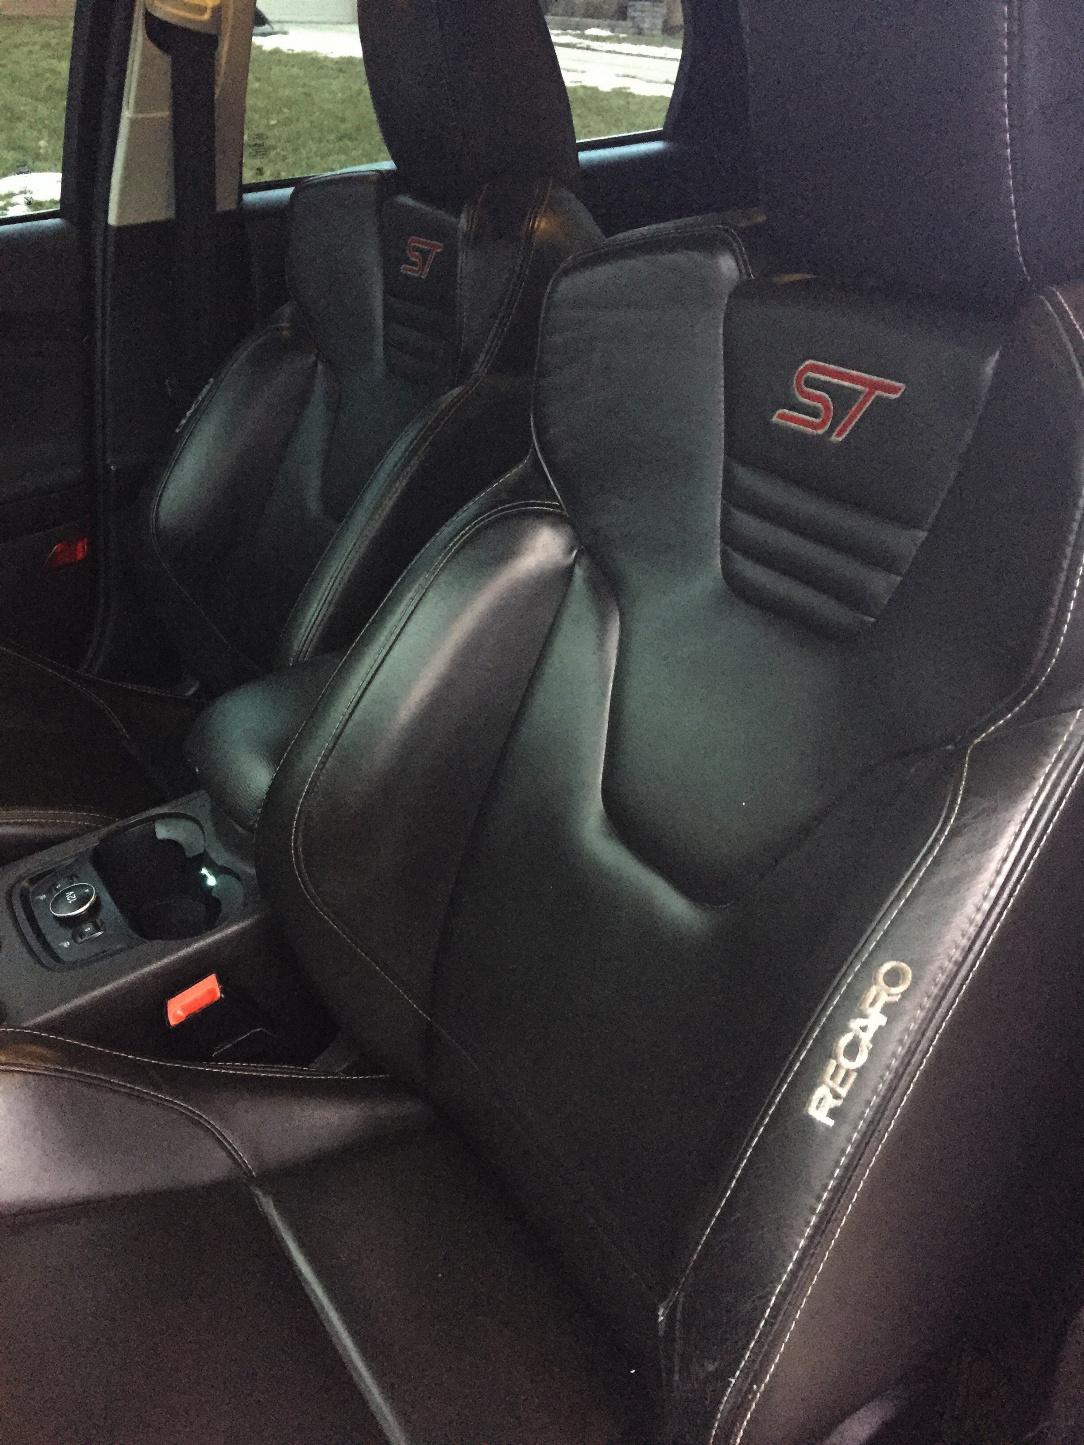 Toms Turbo Full Kit-seats.jpg